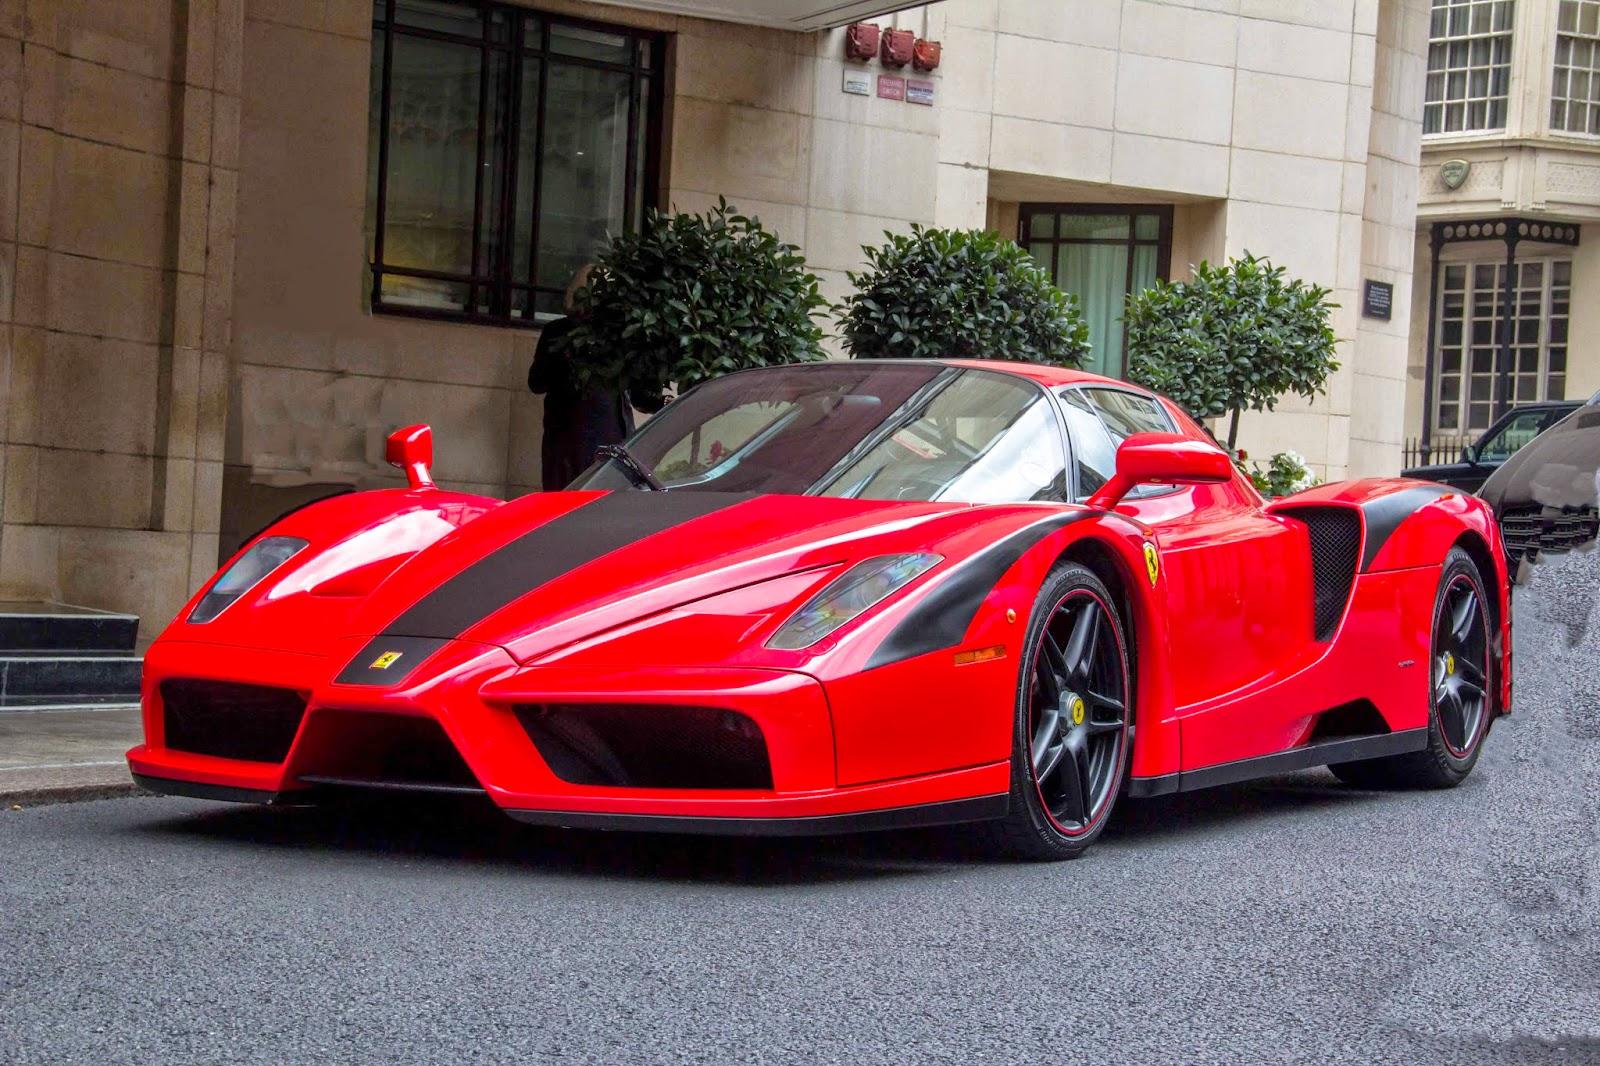 Mobil Ferrari: Mobil Ferrari Enzo Menggunakan Teknologi Formula Satu